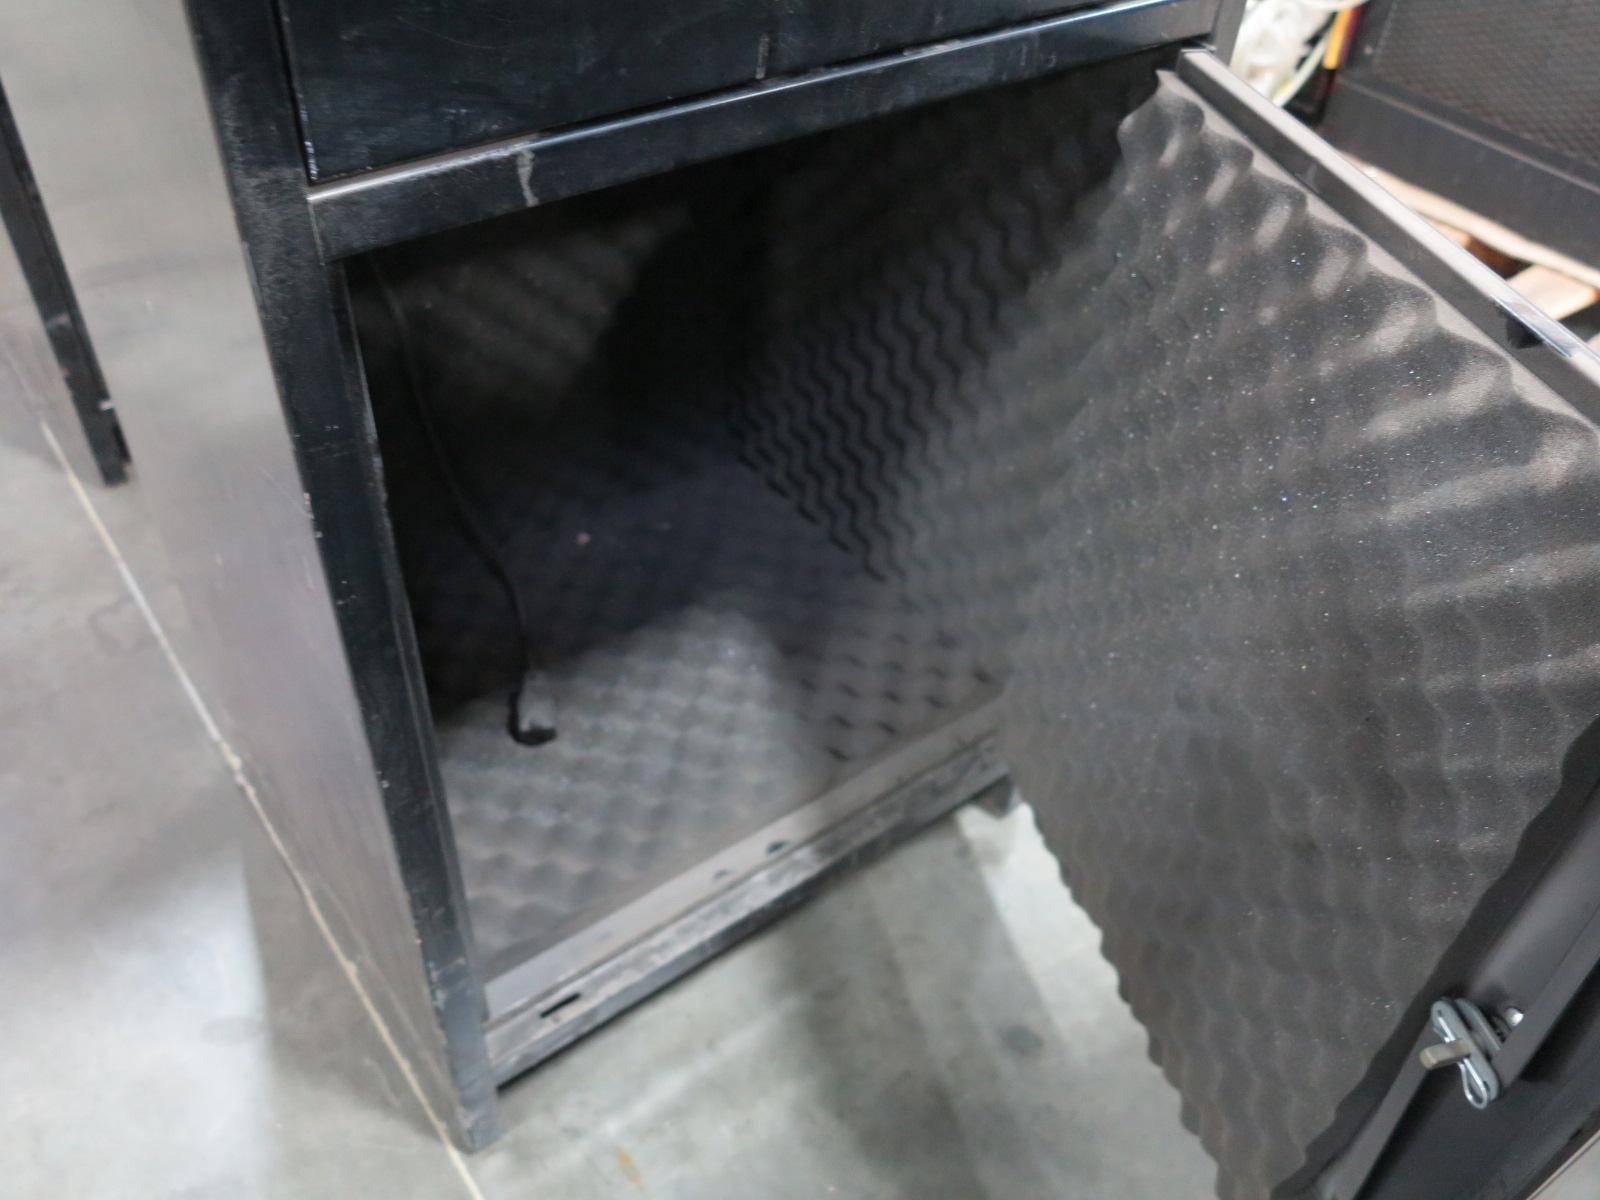 Lot 45 - Diamond Ground Products Piranha III Tungsten Electrode Grinder, s/n P3-07112922-R2-V2, w/ Vacuum